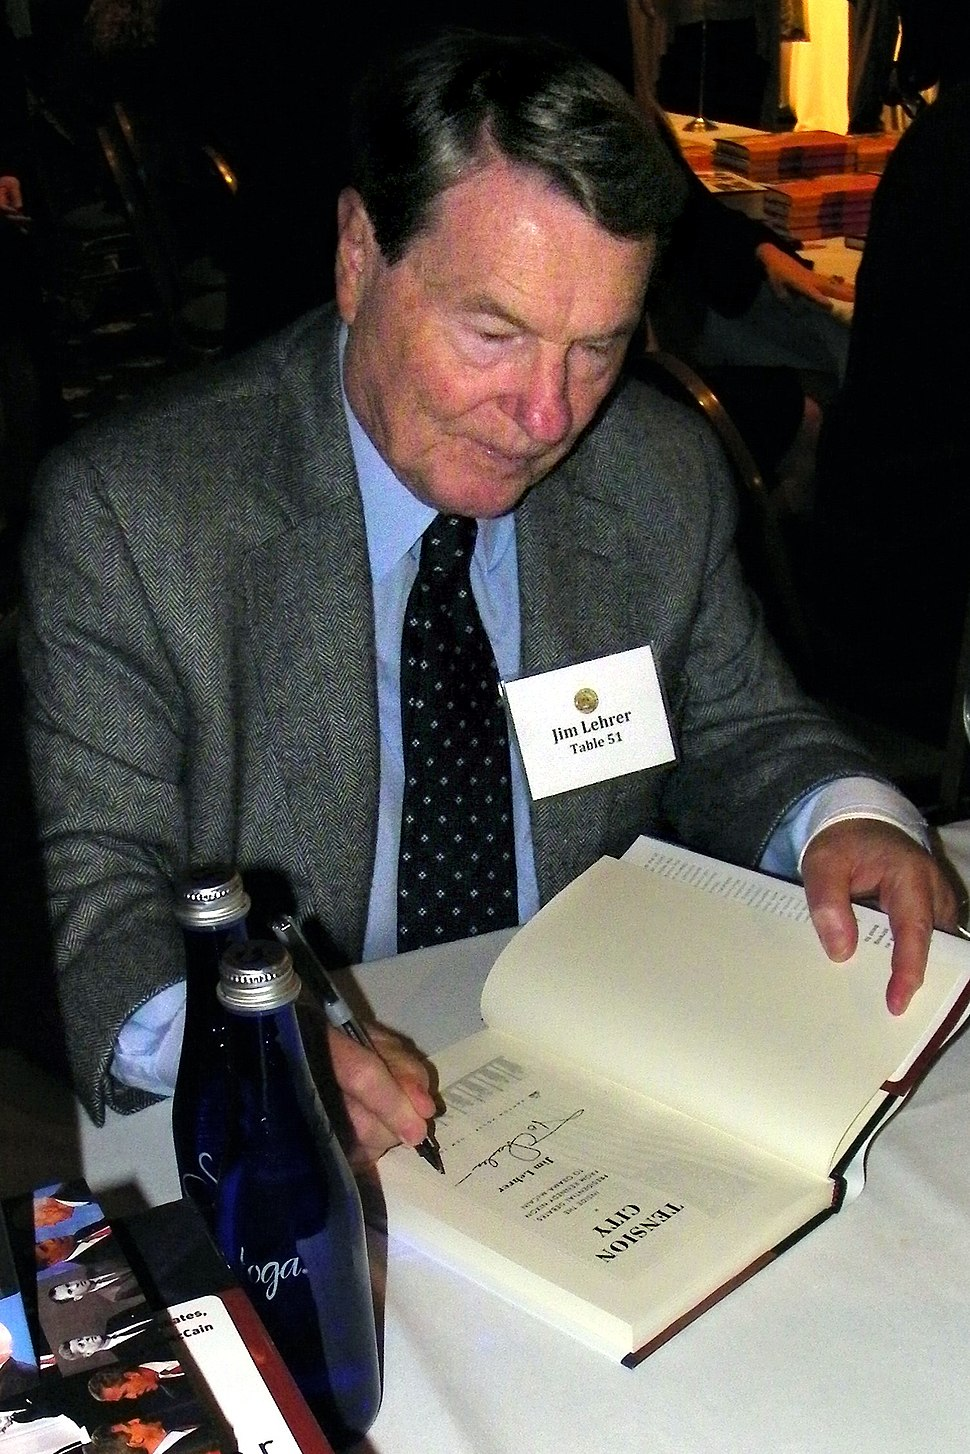 Jim Lehrer 2011